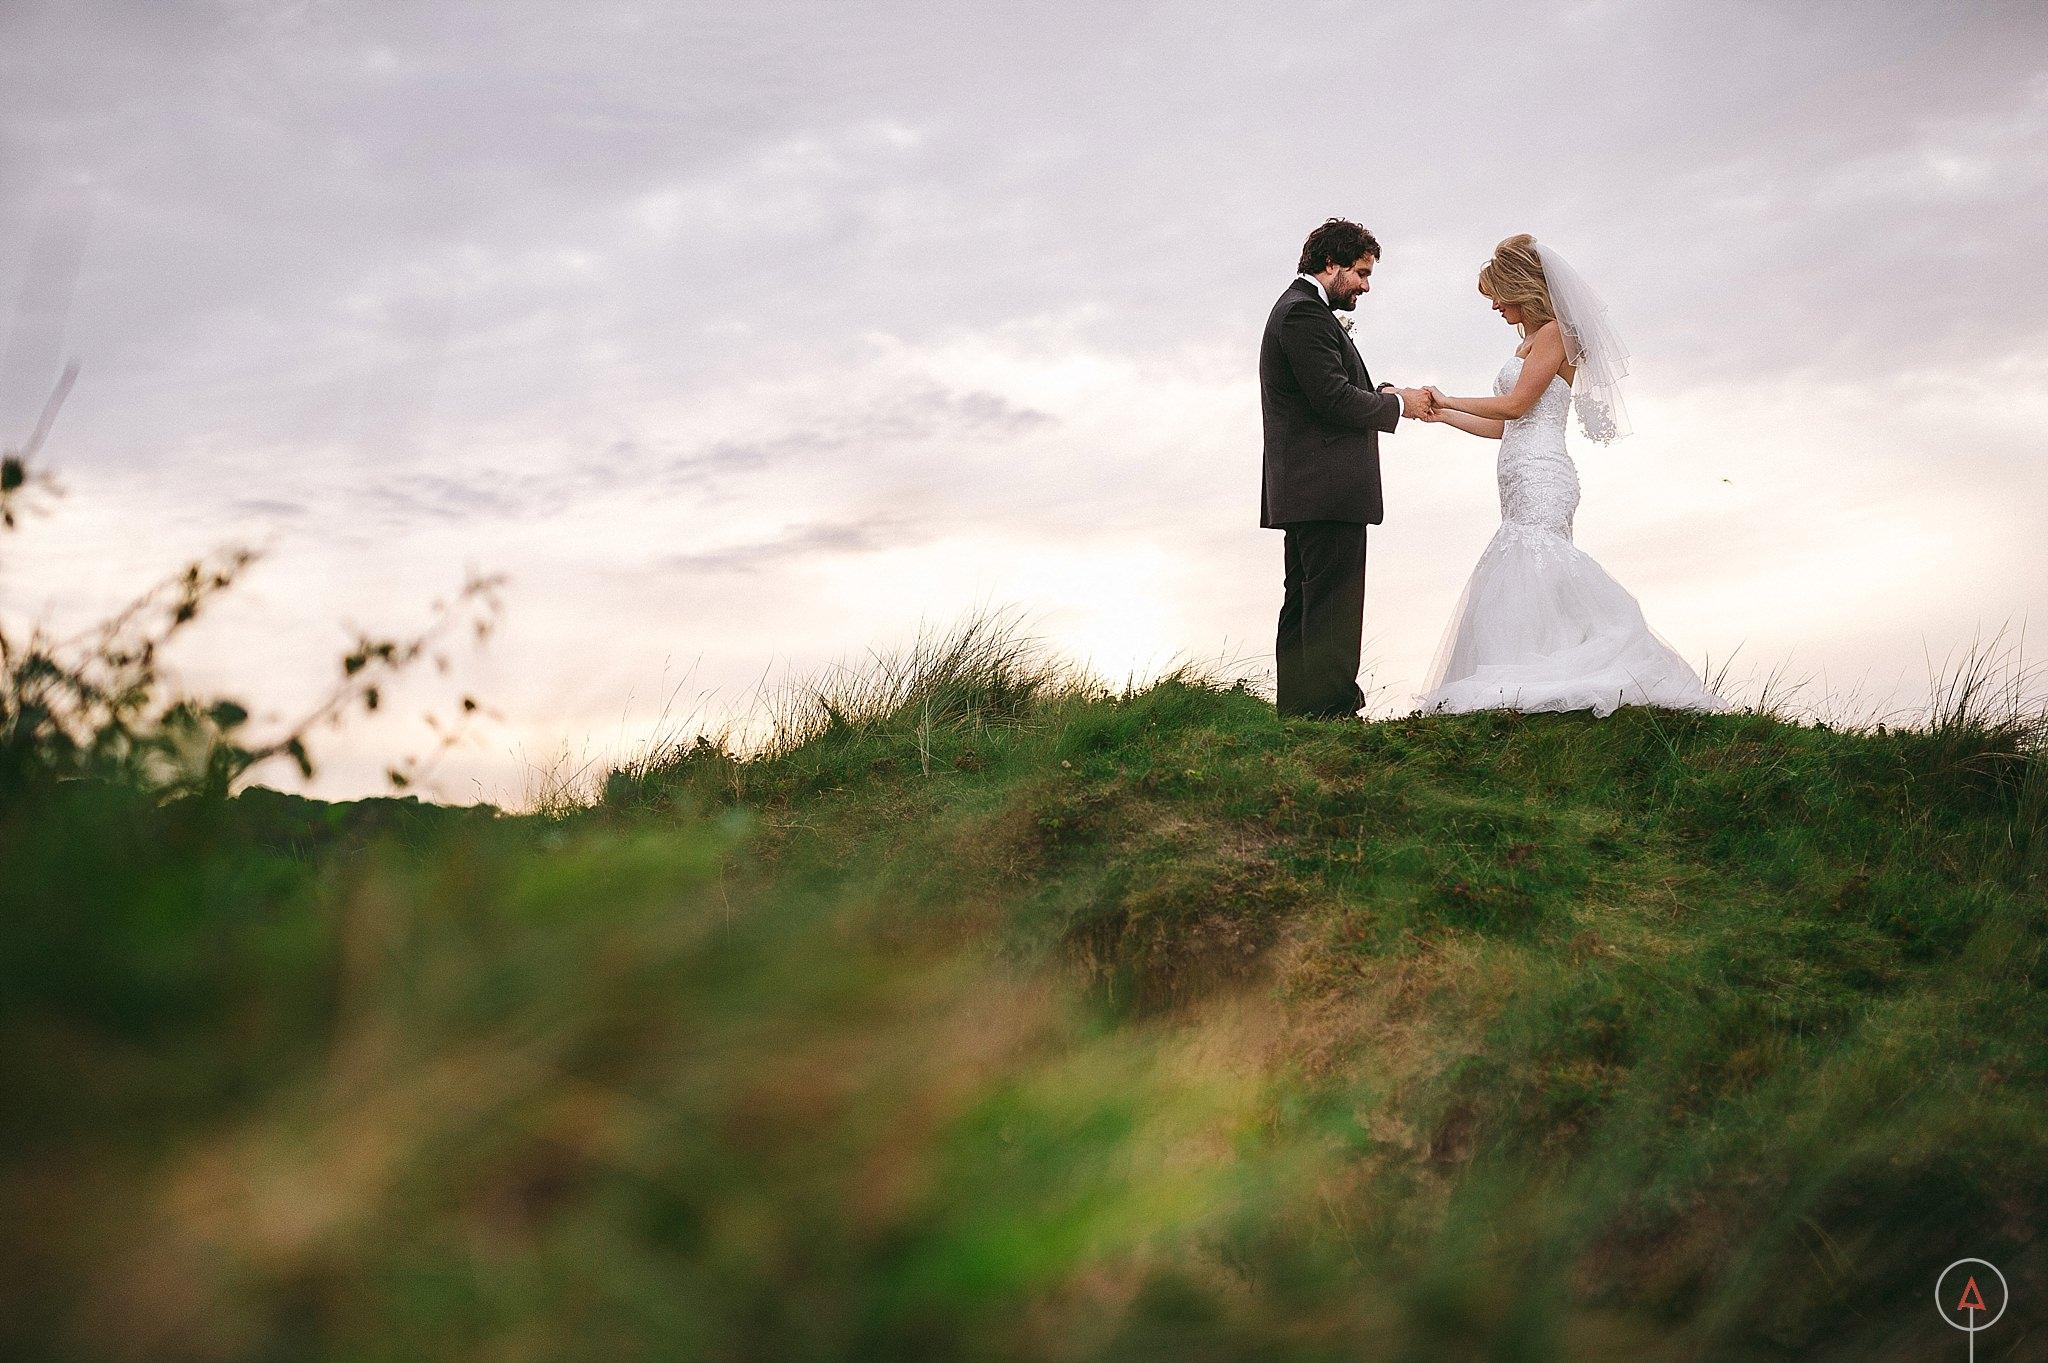 cardiff-wedding-photographer-aga-tomaszek_0407